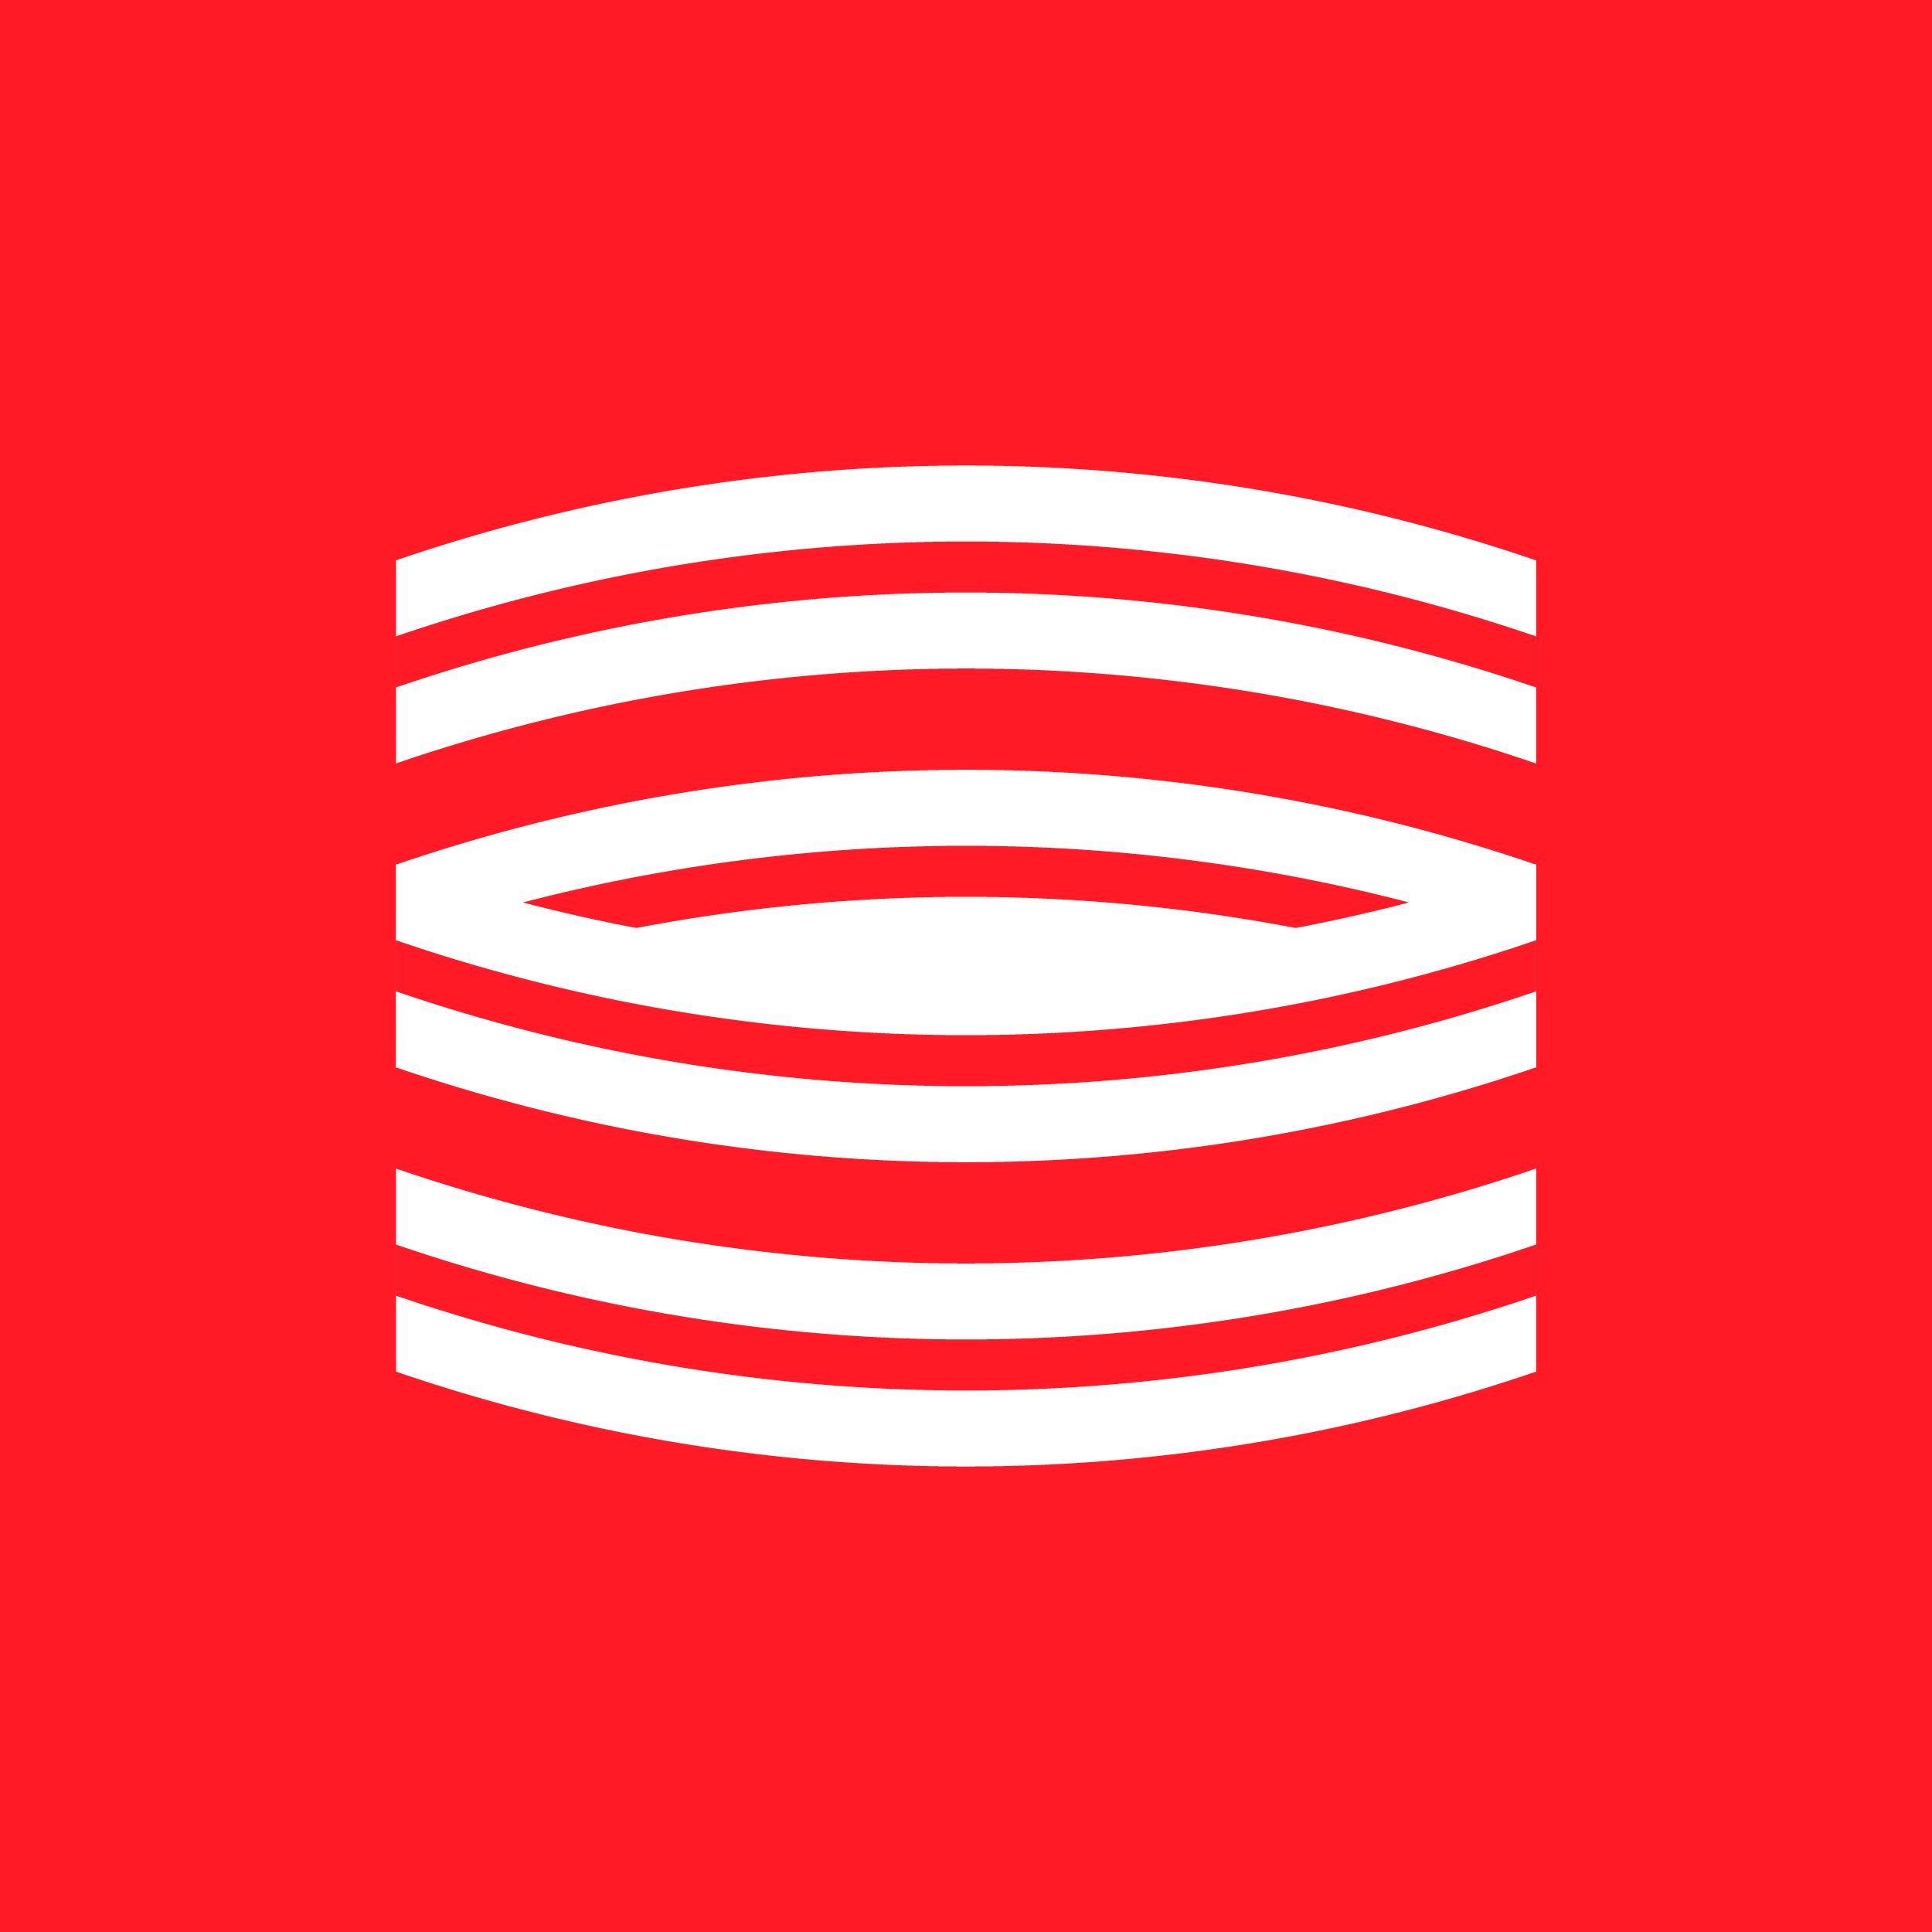 Pin by John McHugh on Trademark Modern logo design